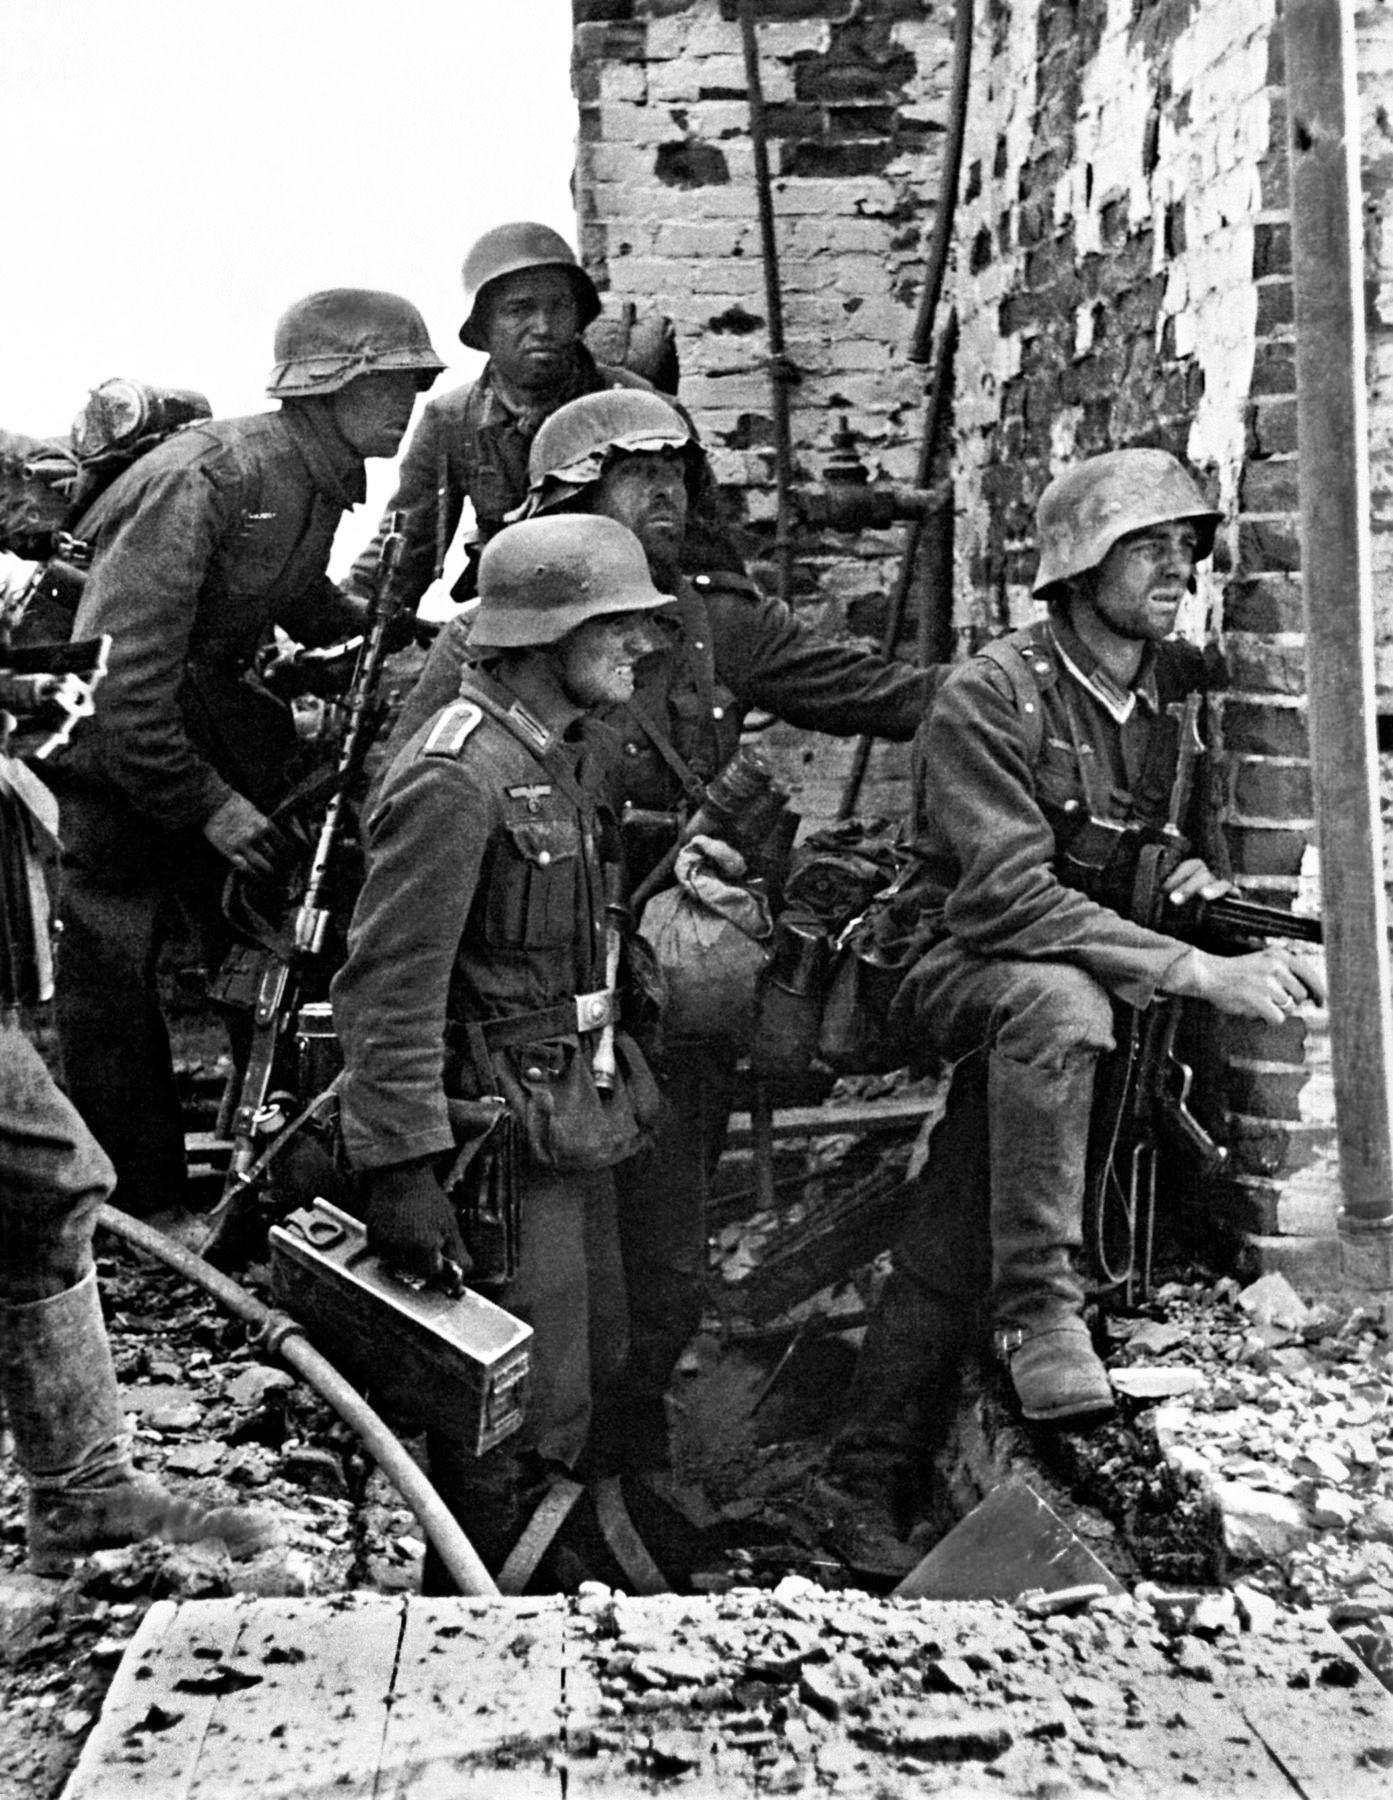 an essay on stalingrad during world war ii 28-4-2016 revised july 2014 9-12-2017 an essay on stalingrad during world war ii.